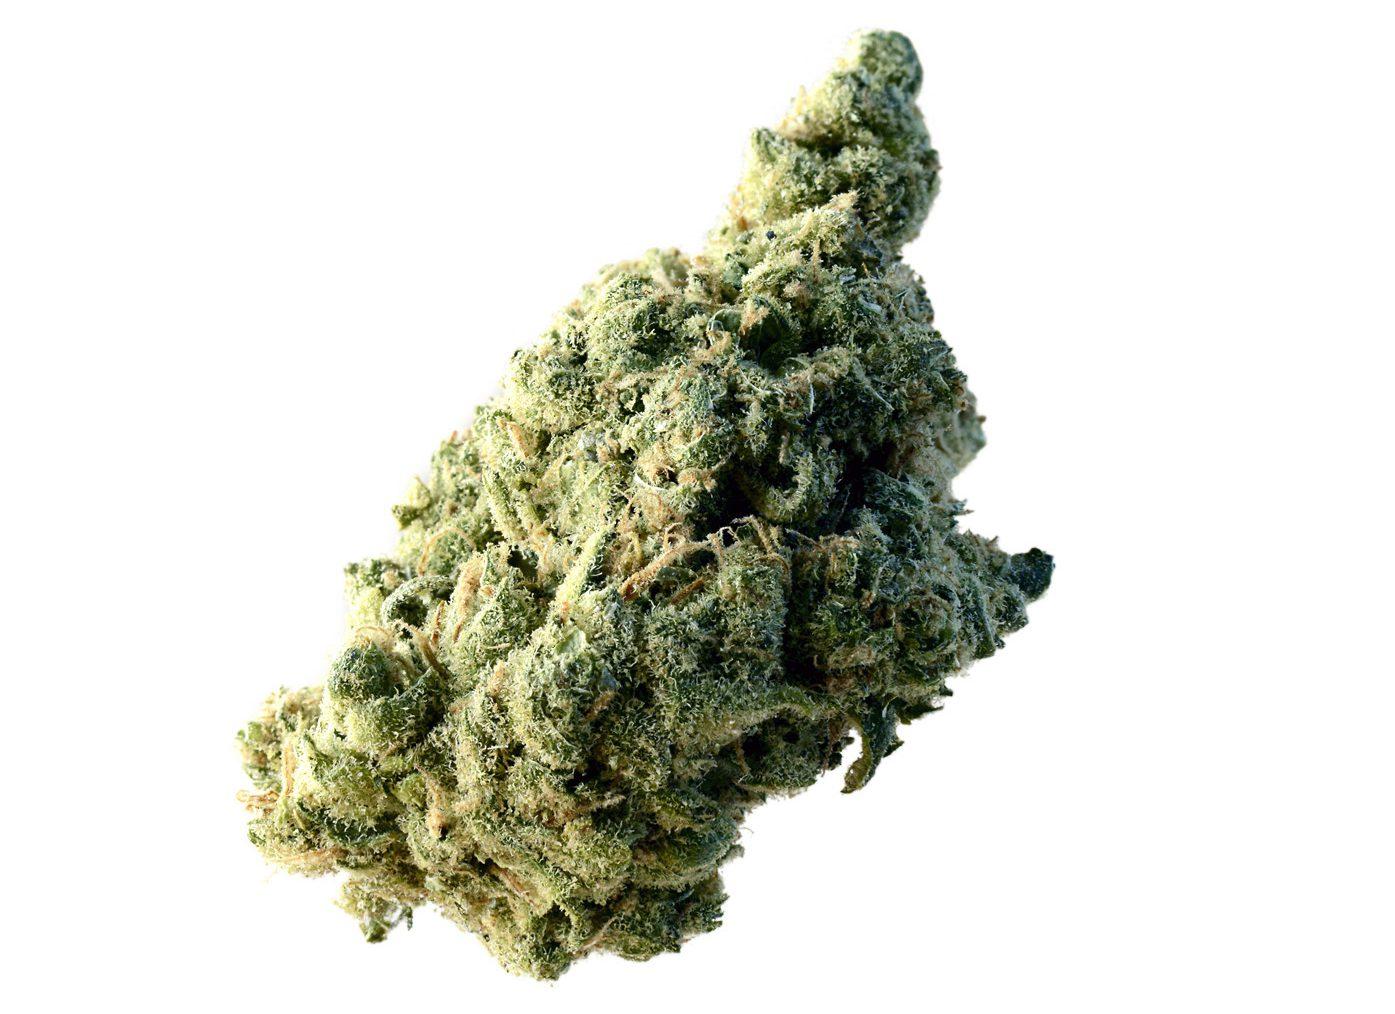 Lemon Ice cannabis tegen angst